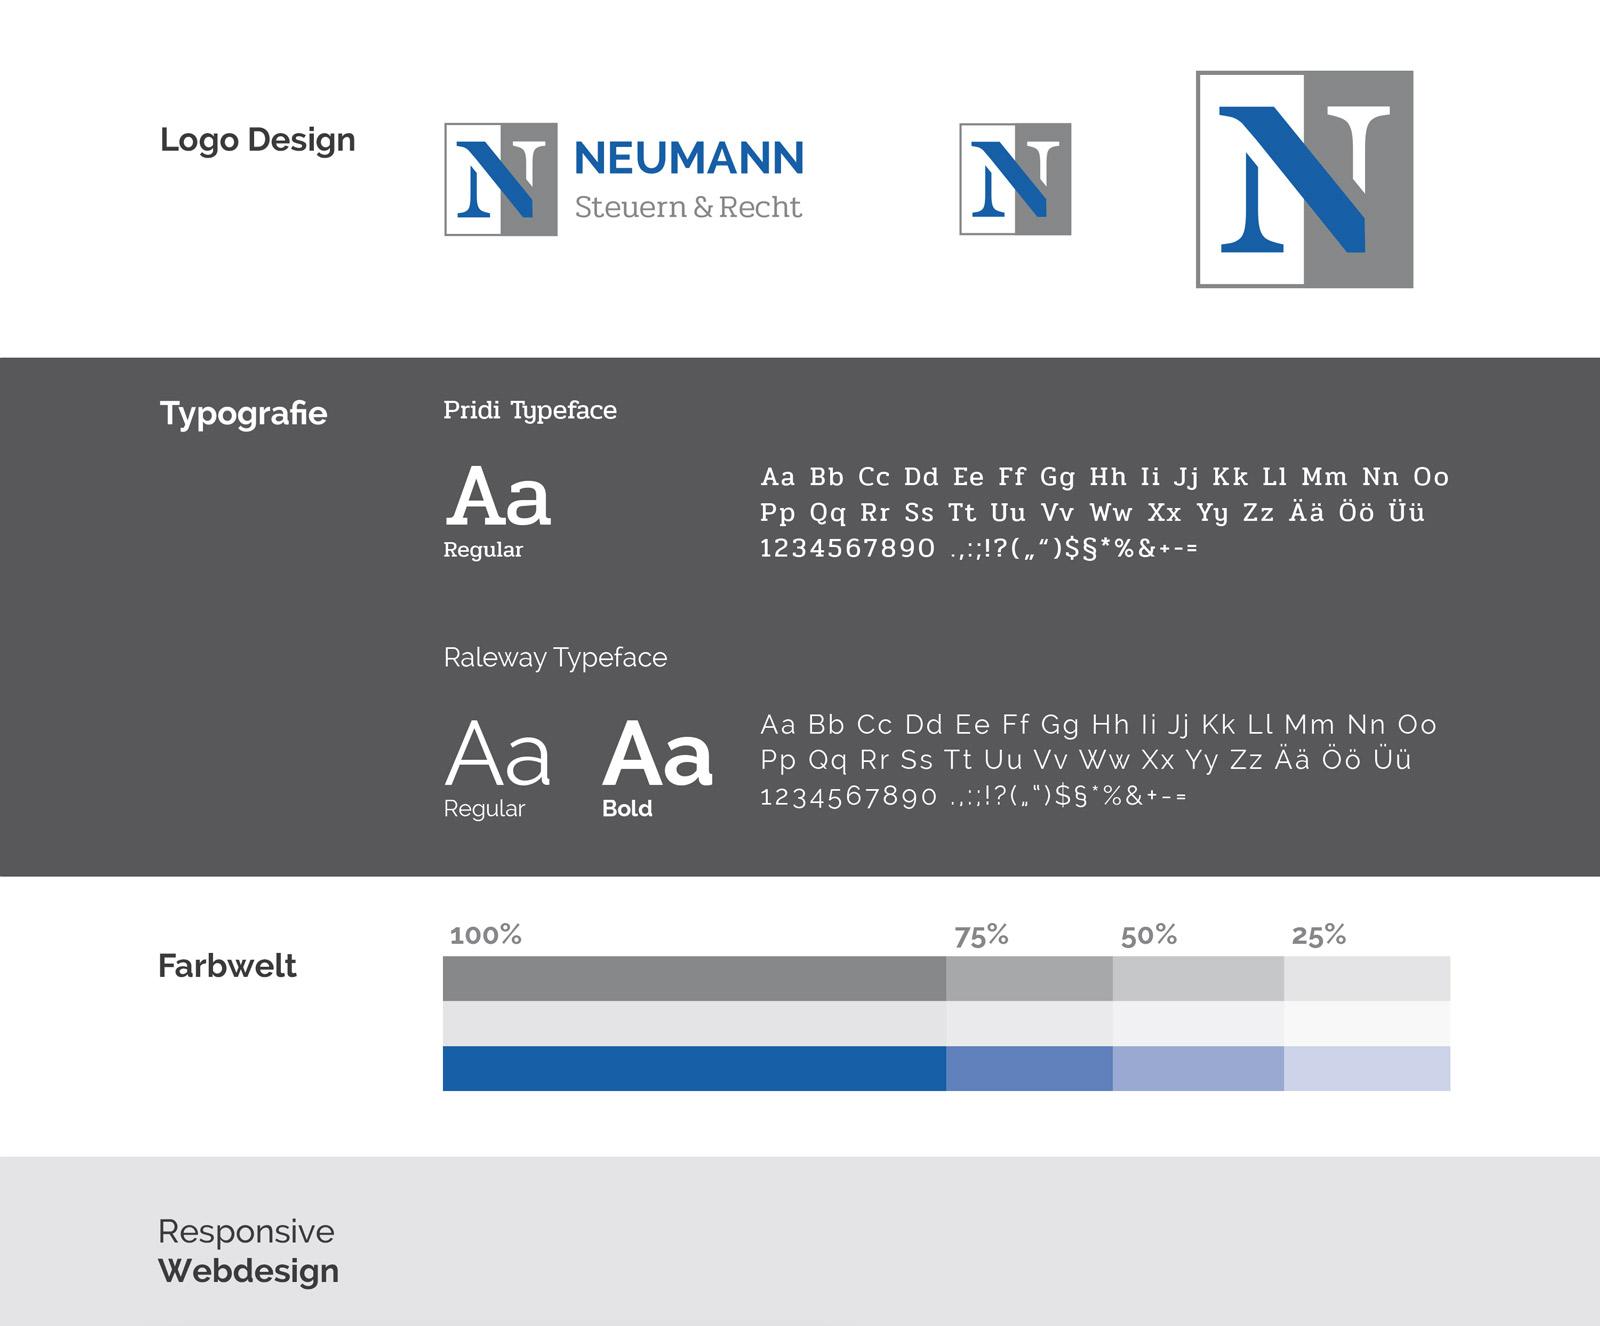 Neumann_Corporate_Design_Logo_Design_3.jpg